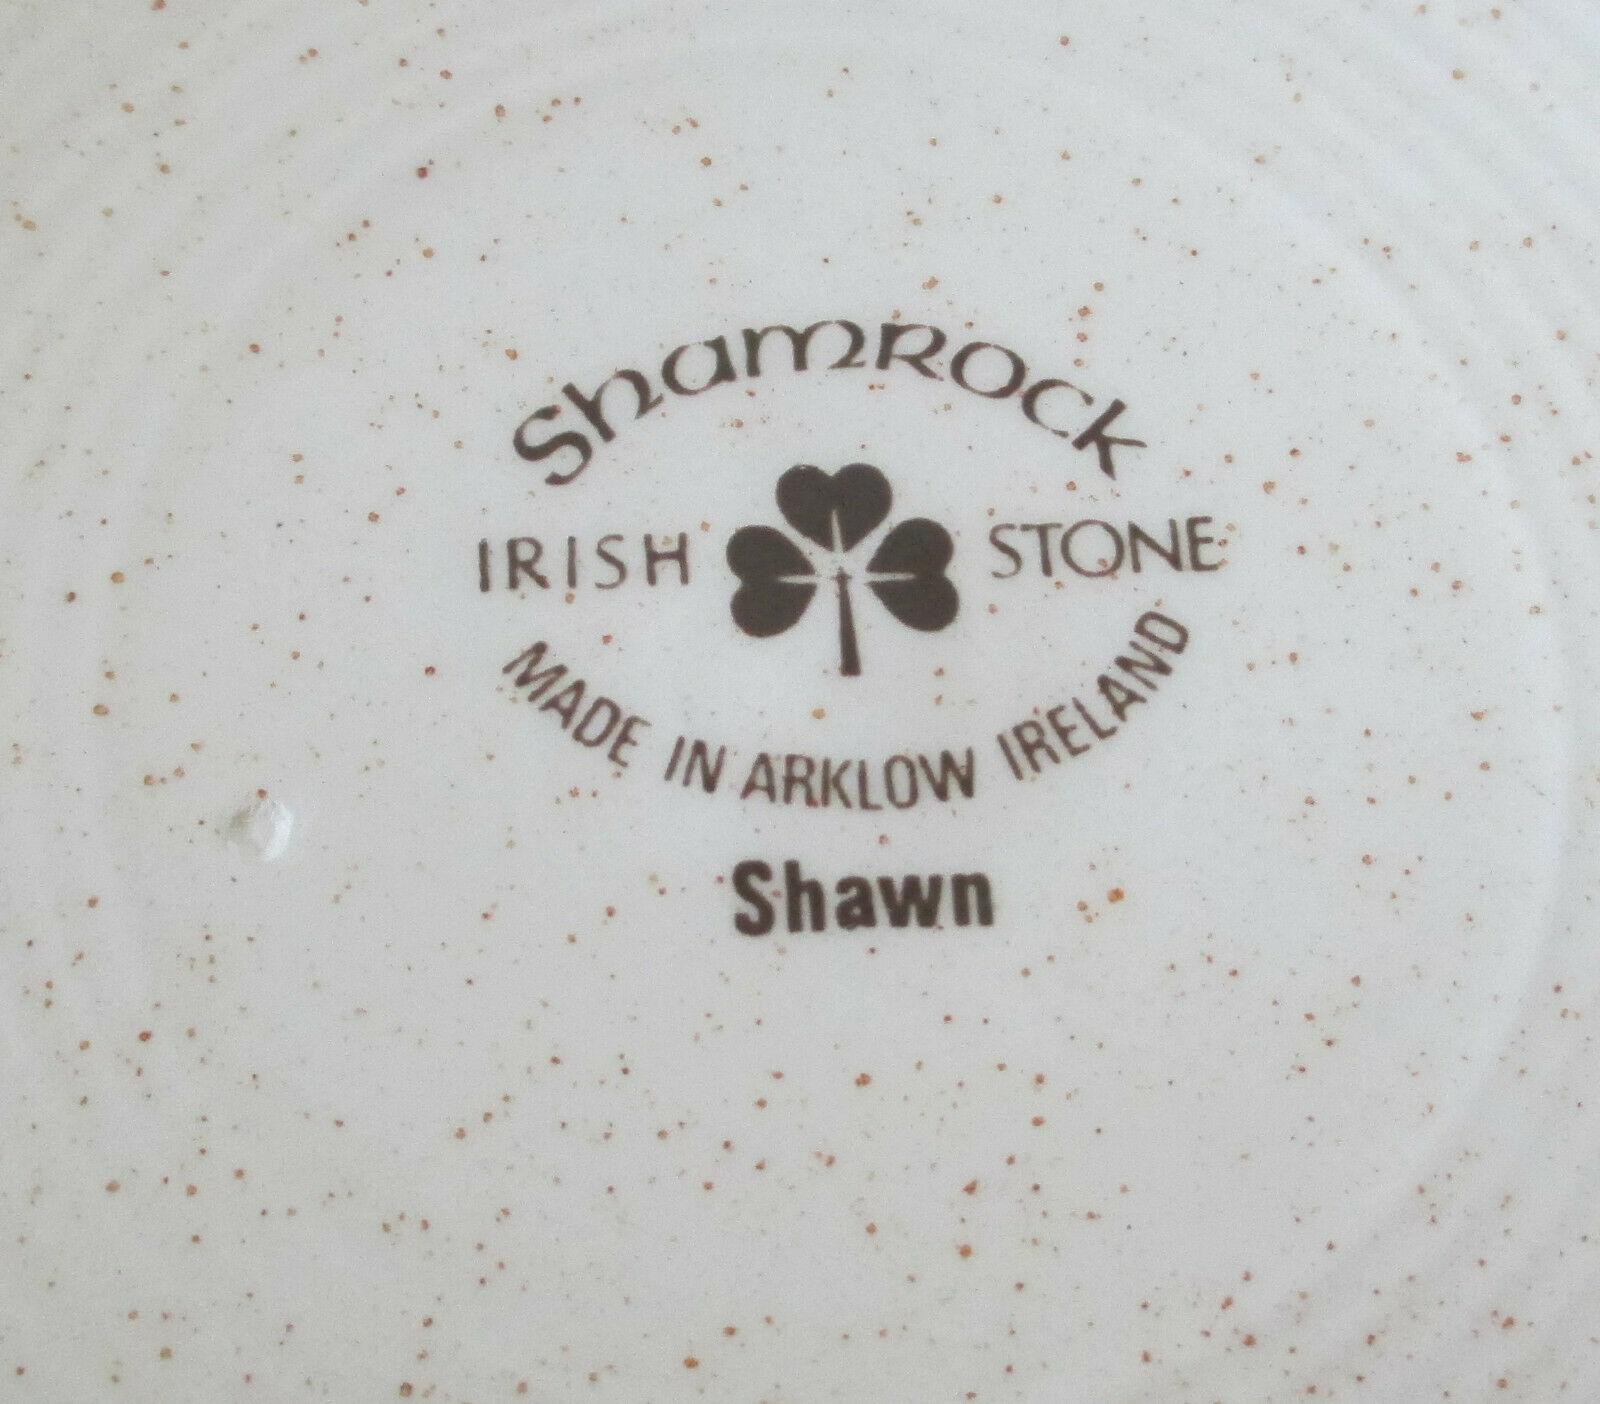 Arklow Ireland Irish Stone Shawn Dinner Plate set of 3 image 5